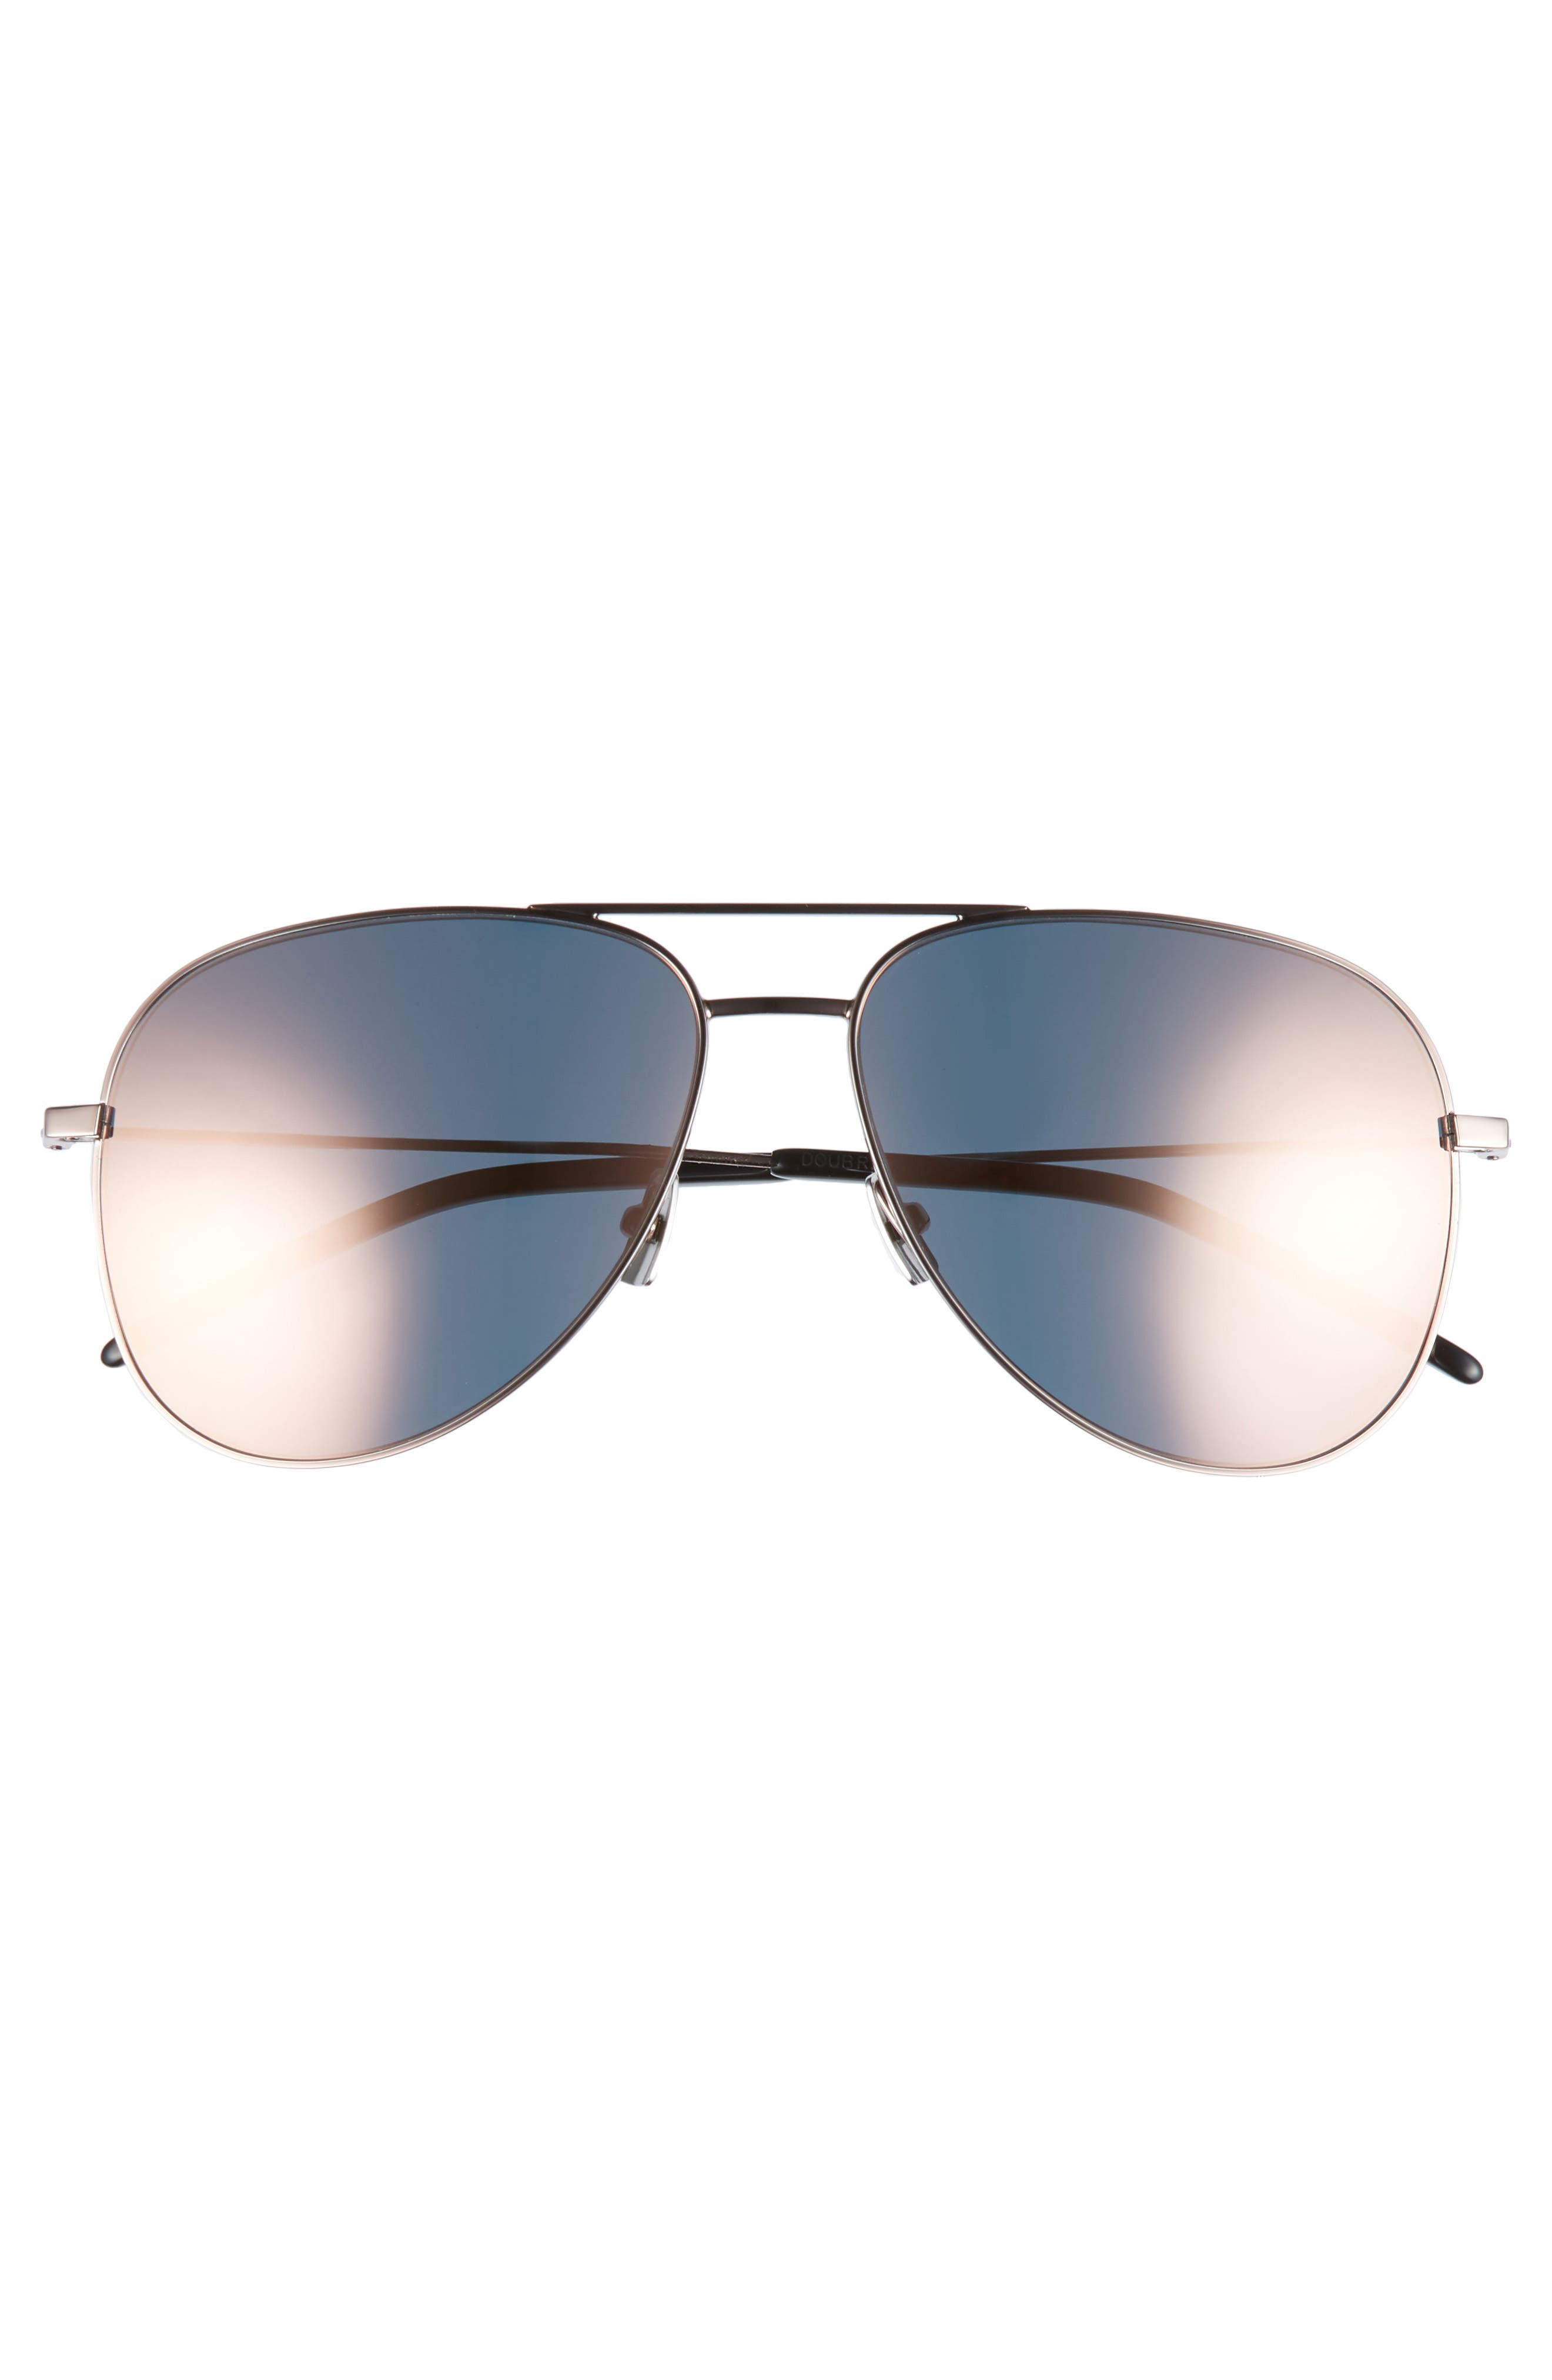 59mm Brow Bar Aviator Sunglasses,                             Alternate thumbnail 3, color,                             Champagne